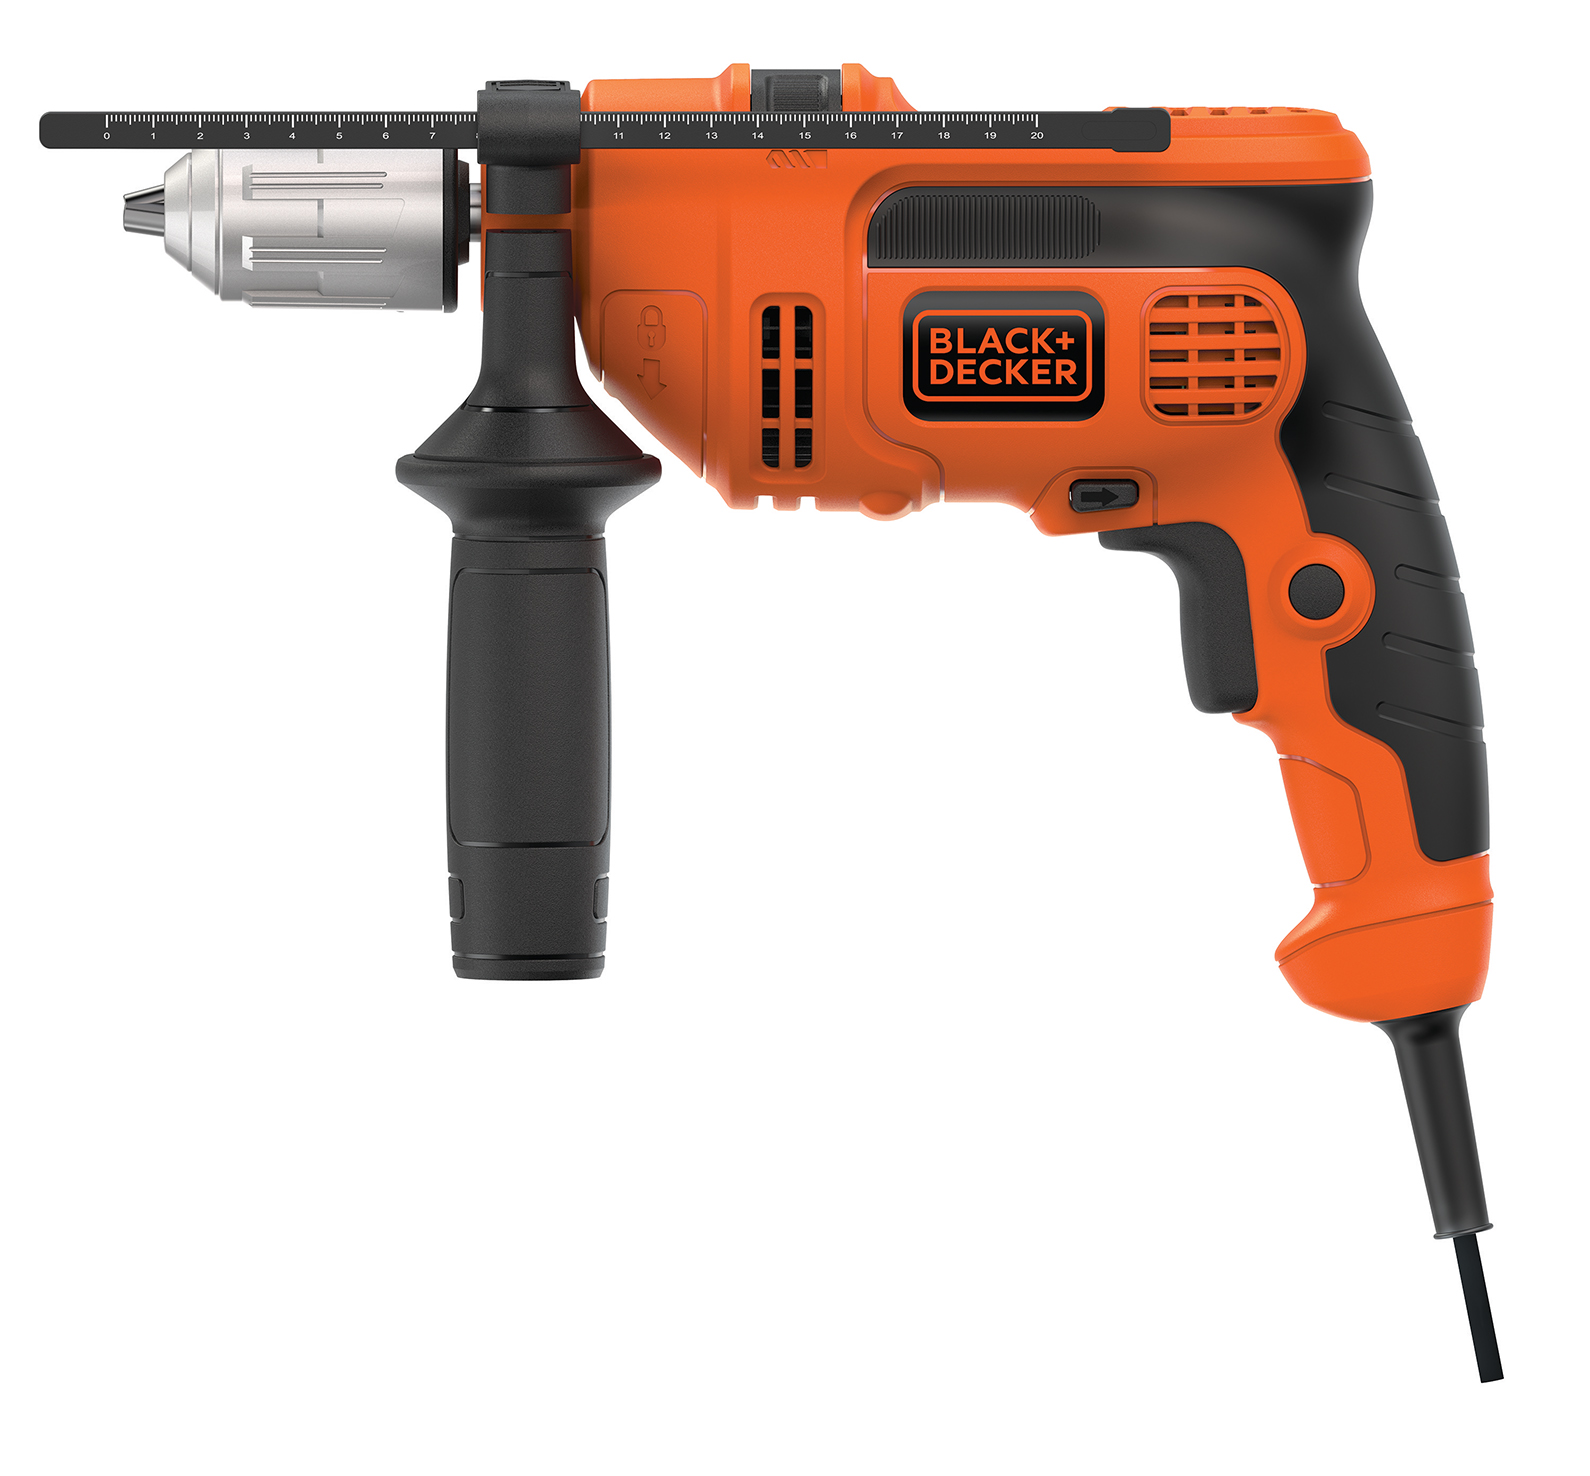 BLACK+DECKER 6.0 Amp 1/2-Inch Corded Vsr Hammer Drill, DR670